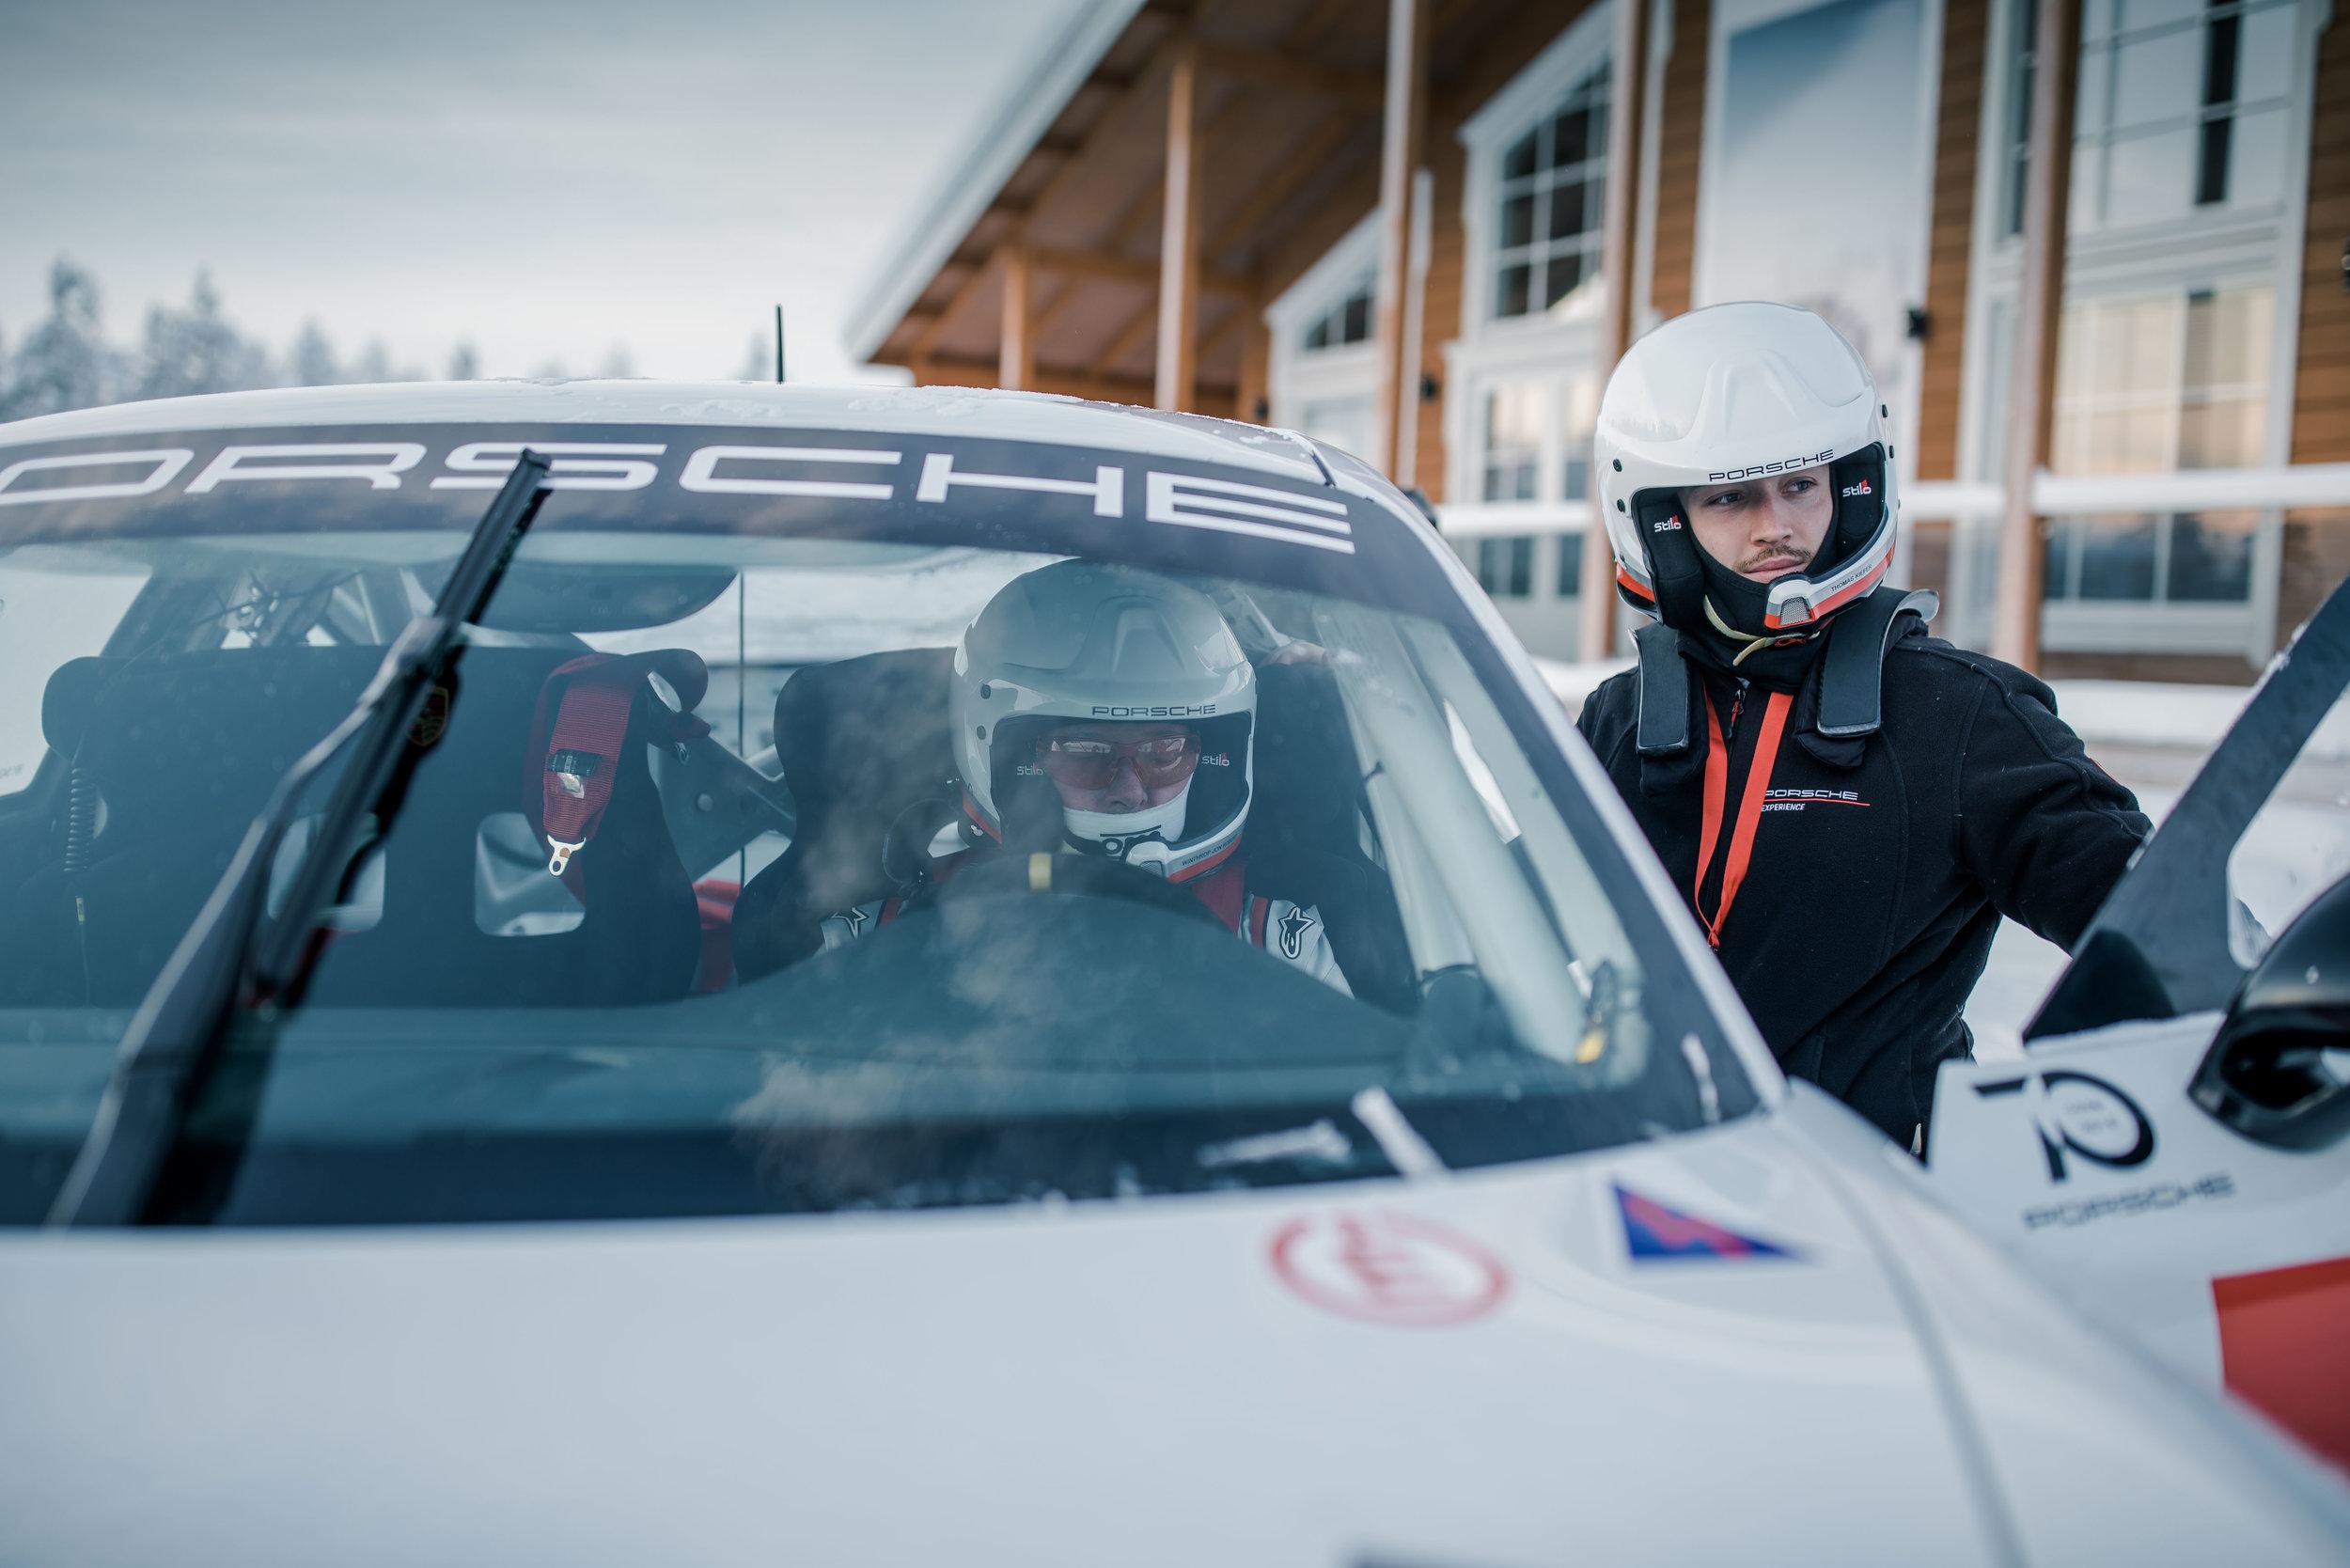 Porsche Ice Experience on Ice_30_01_2019_0955_175761.jpg